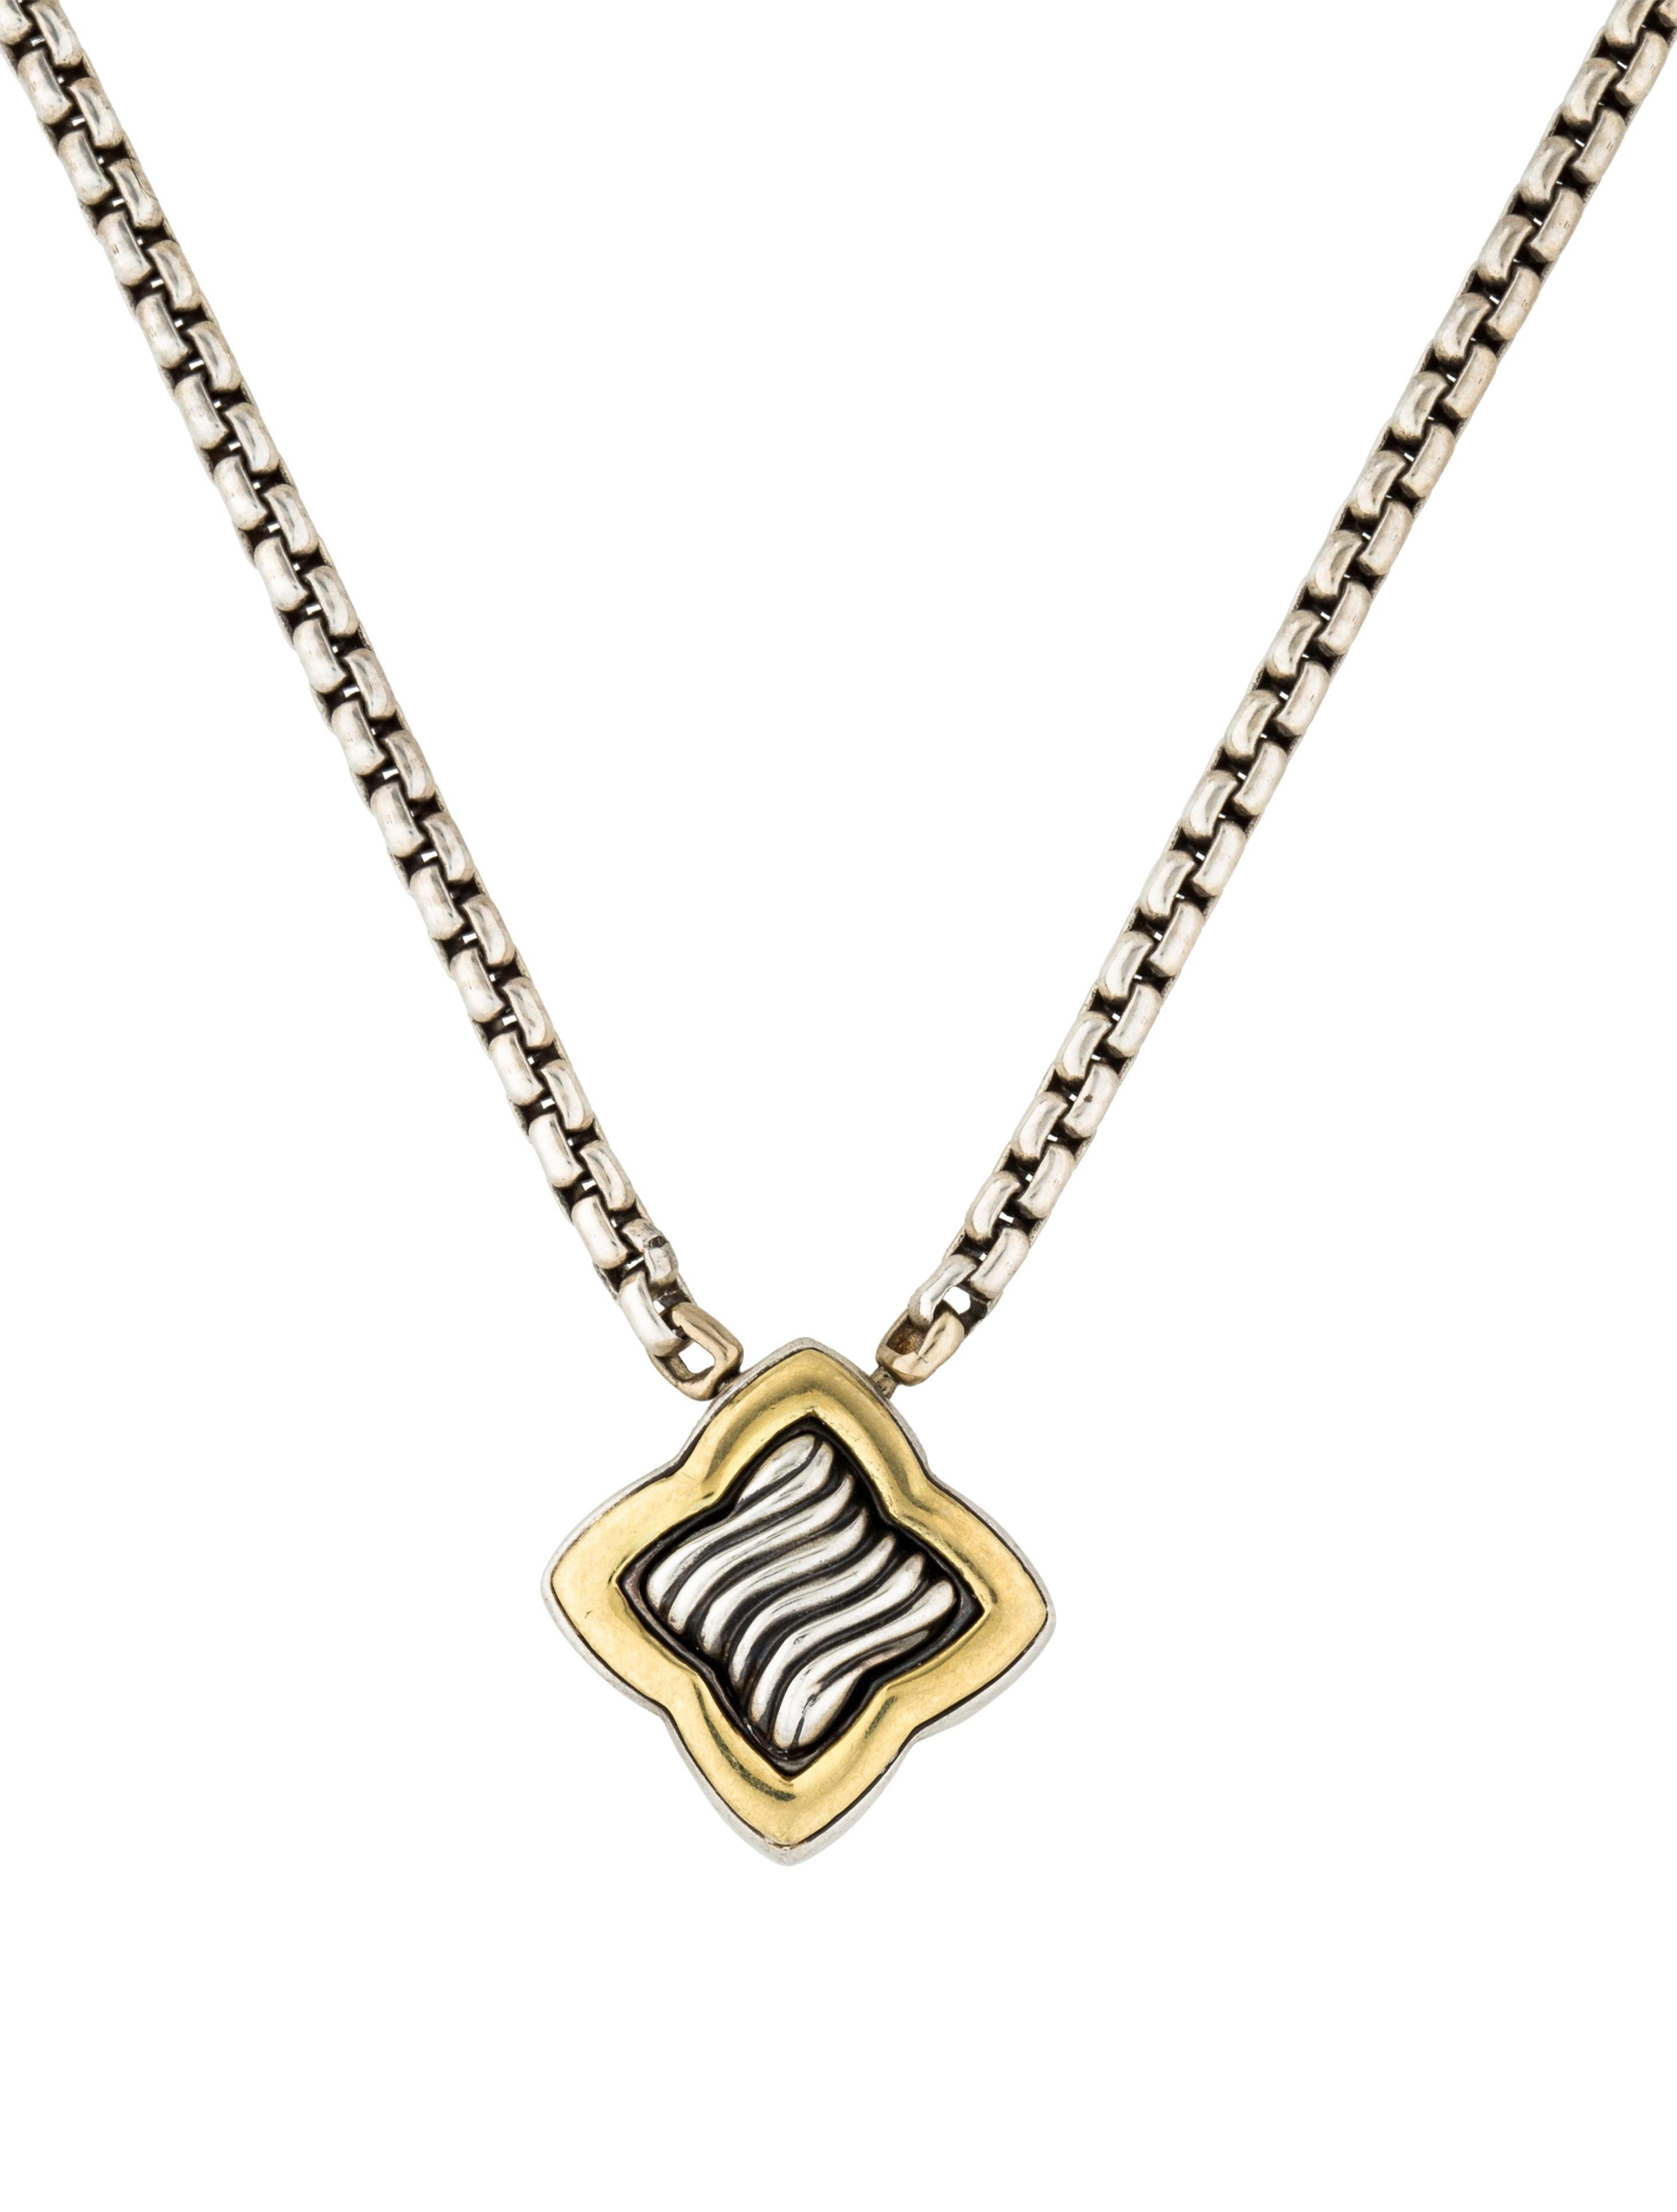 David Yurman Cable Quatrefoil Pendant Necklace  Necklaces. Marcasite Jewelry. Dark Sapphire. Cute Bangle Bracelets. Radiant Cut Engagement Rings. Opal Diamond. Micro Pave Diamond. Sparkly Diamond. Single Pendant Necklace